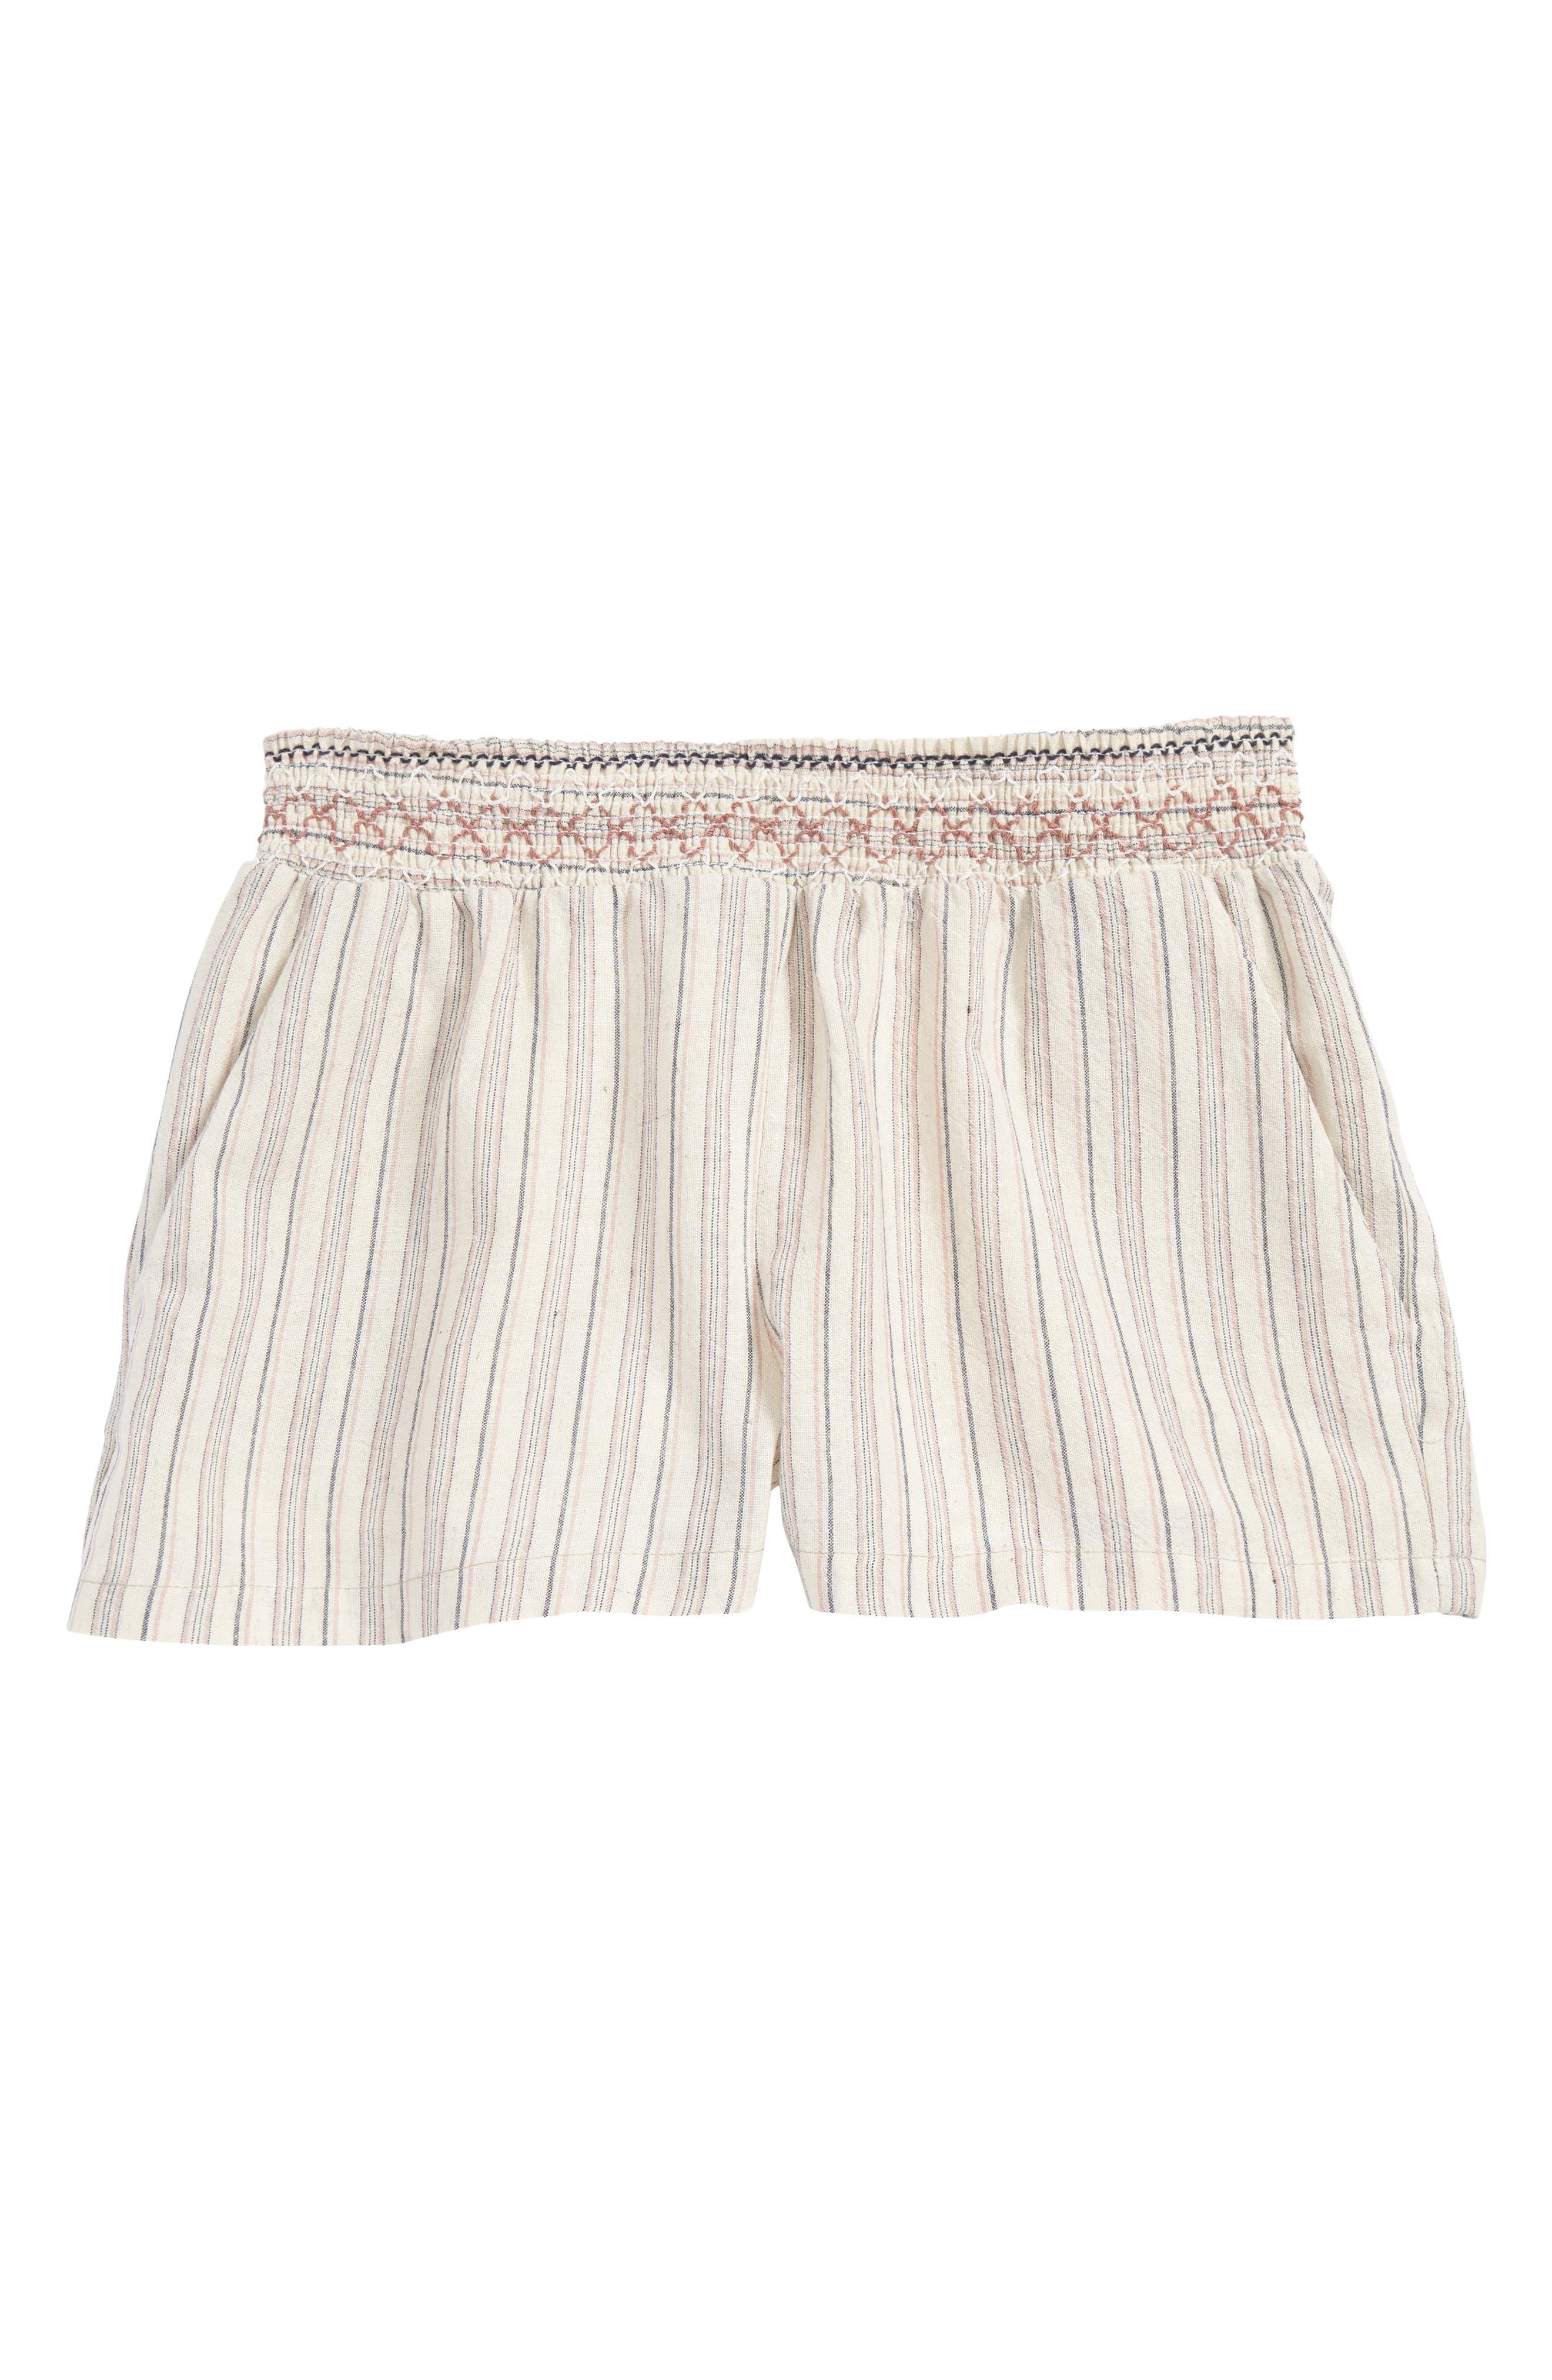 For All Seasons Stripe Woven Shorts (Big Girls)